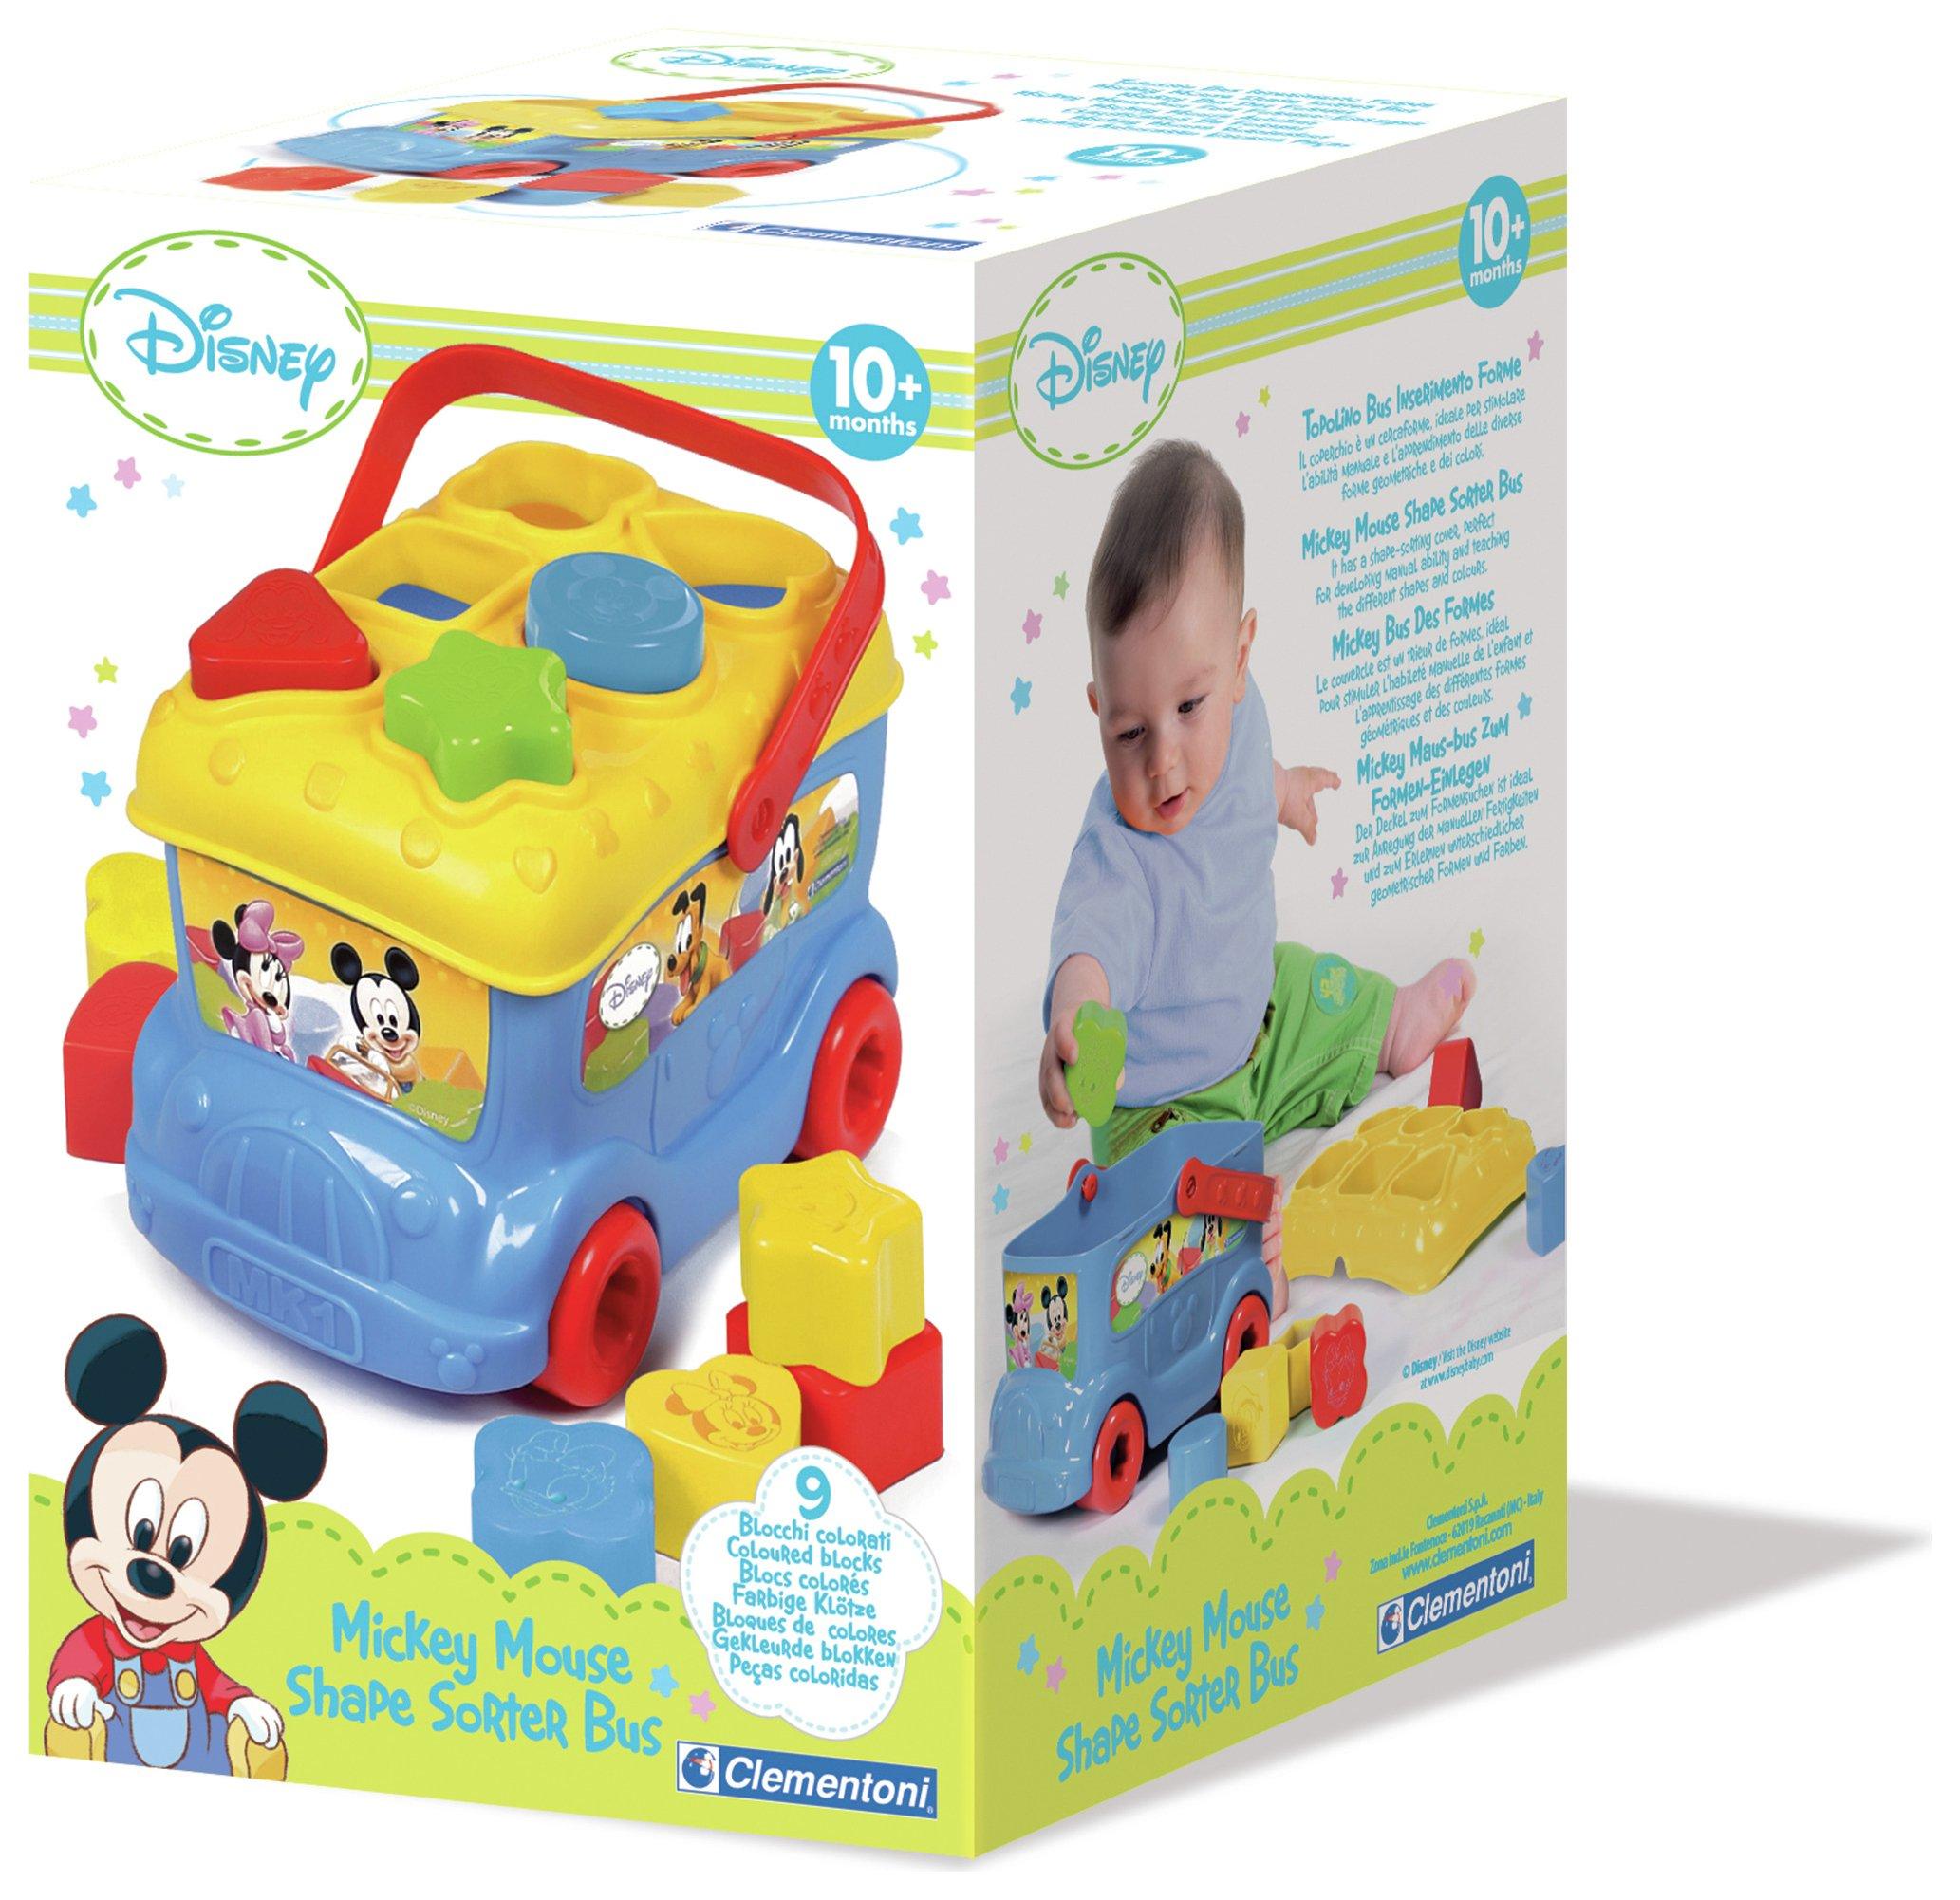 Disney Baby Shape Sorter Bus.